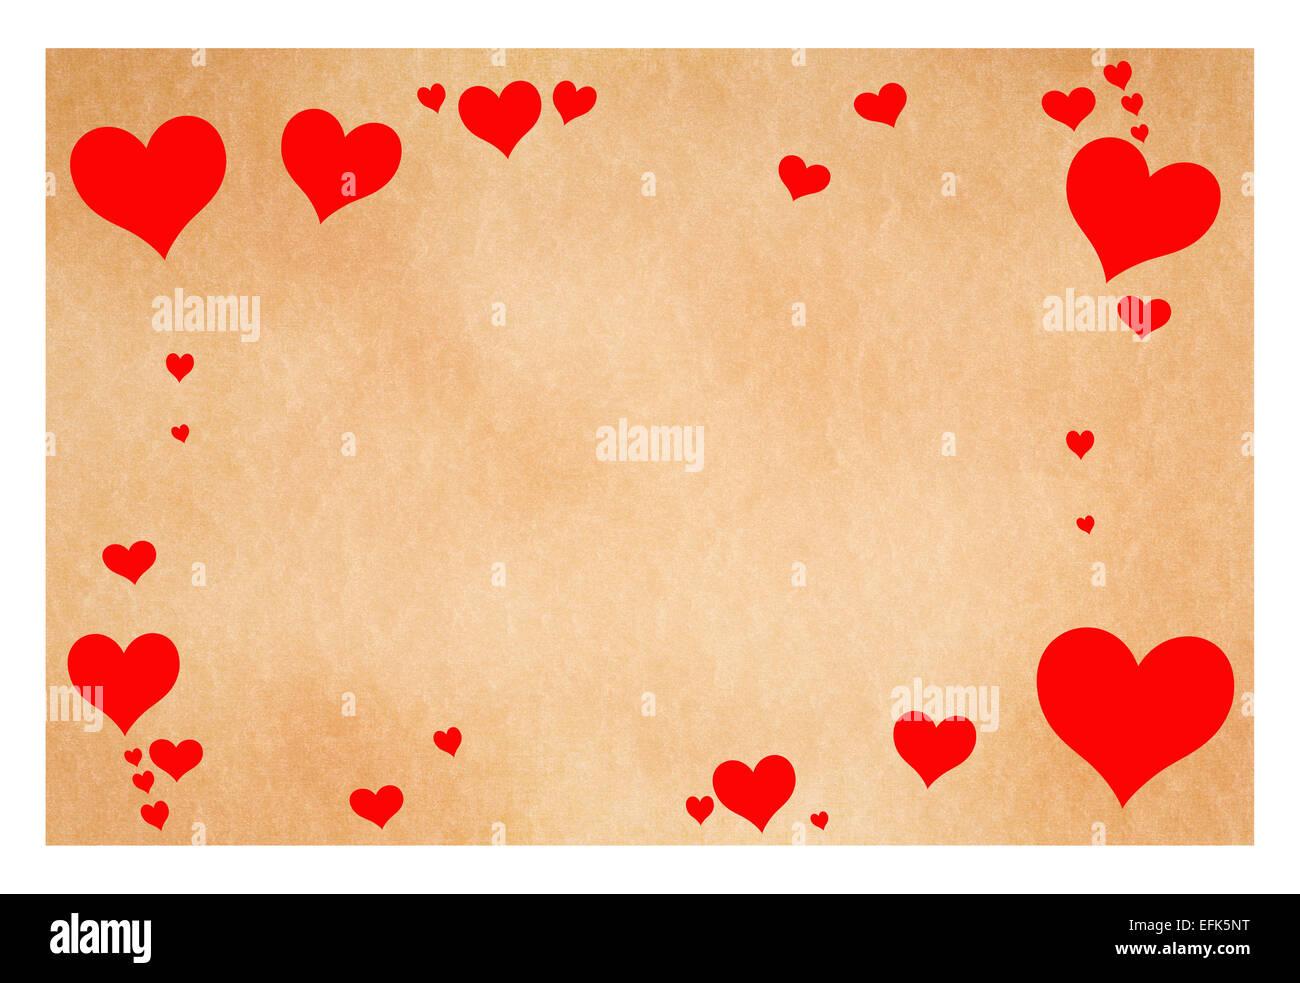 celebrating wedding anniversary heart shape stock photos